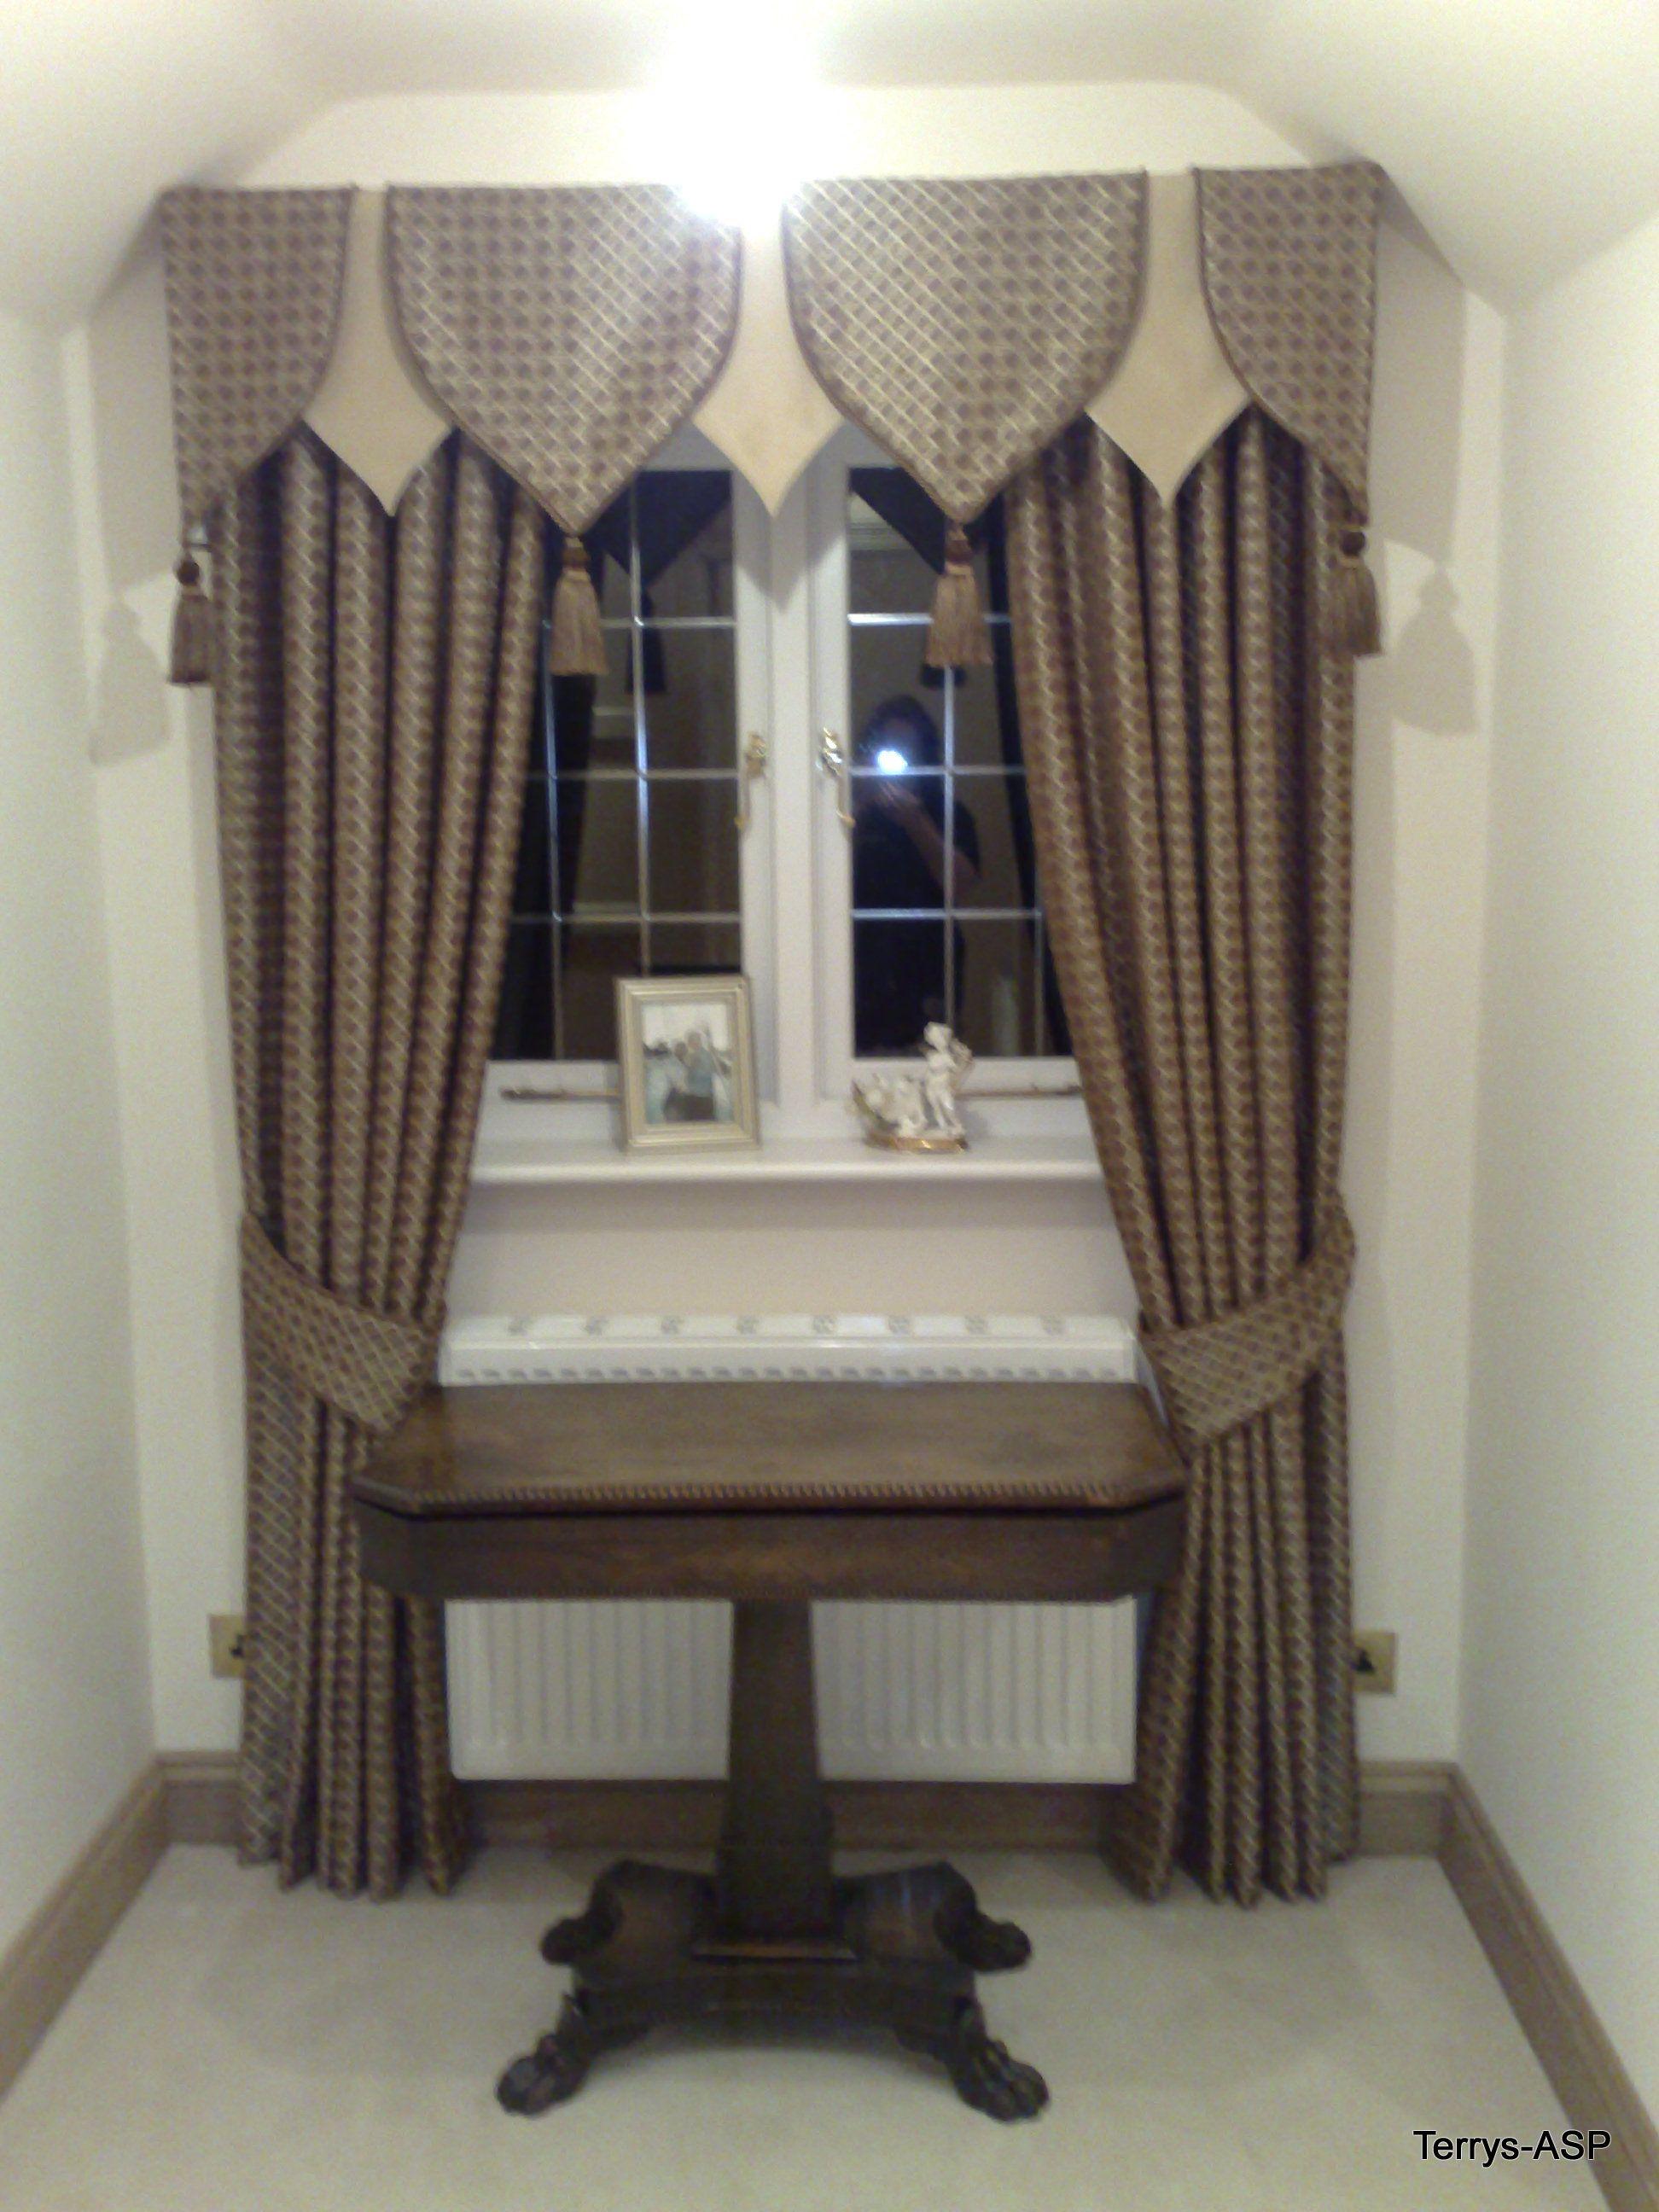 Individual Shields Pelmet And Full Length Curtains Curtain Decor Window Decor Curtains Window Treatments